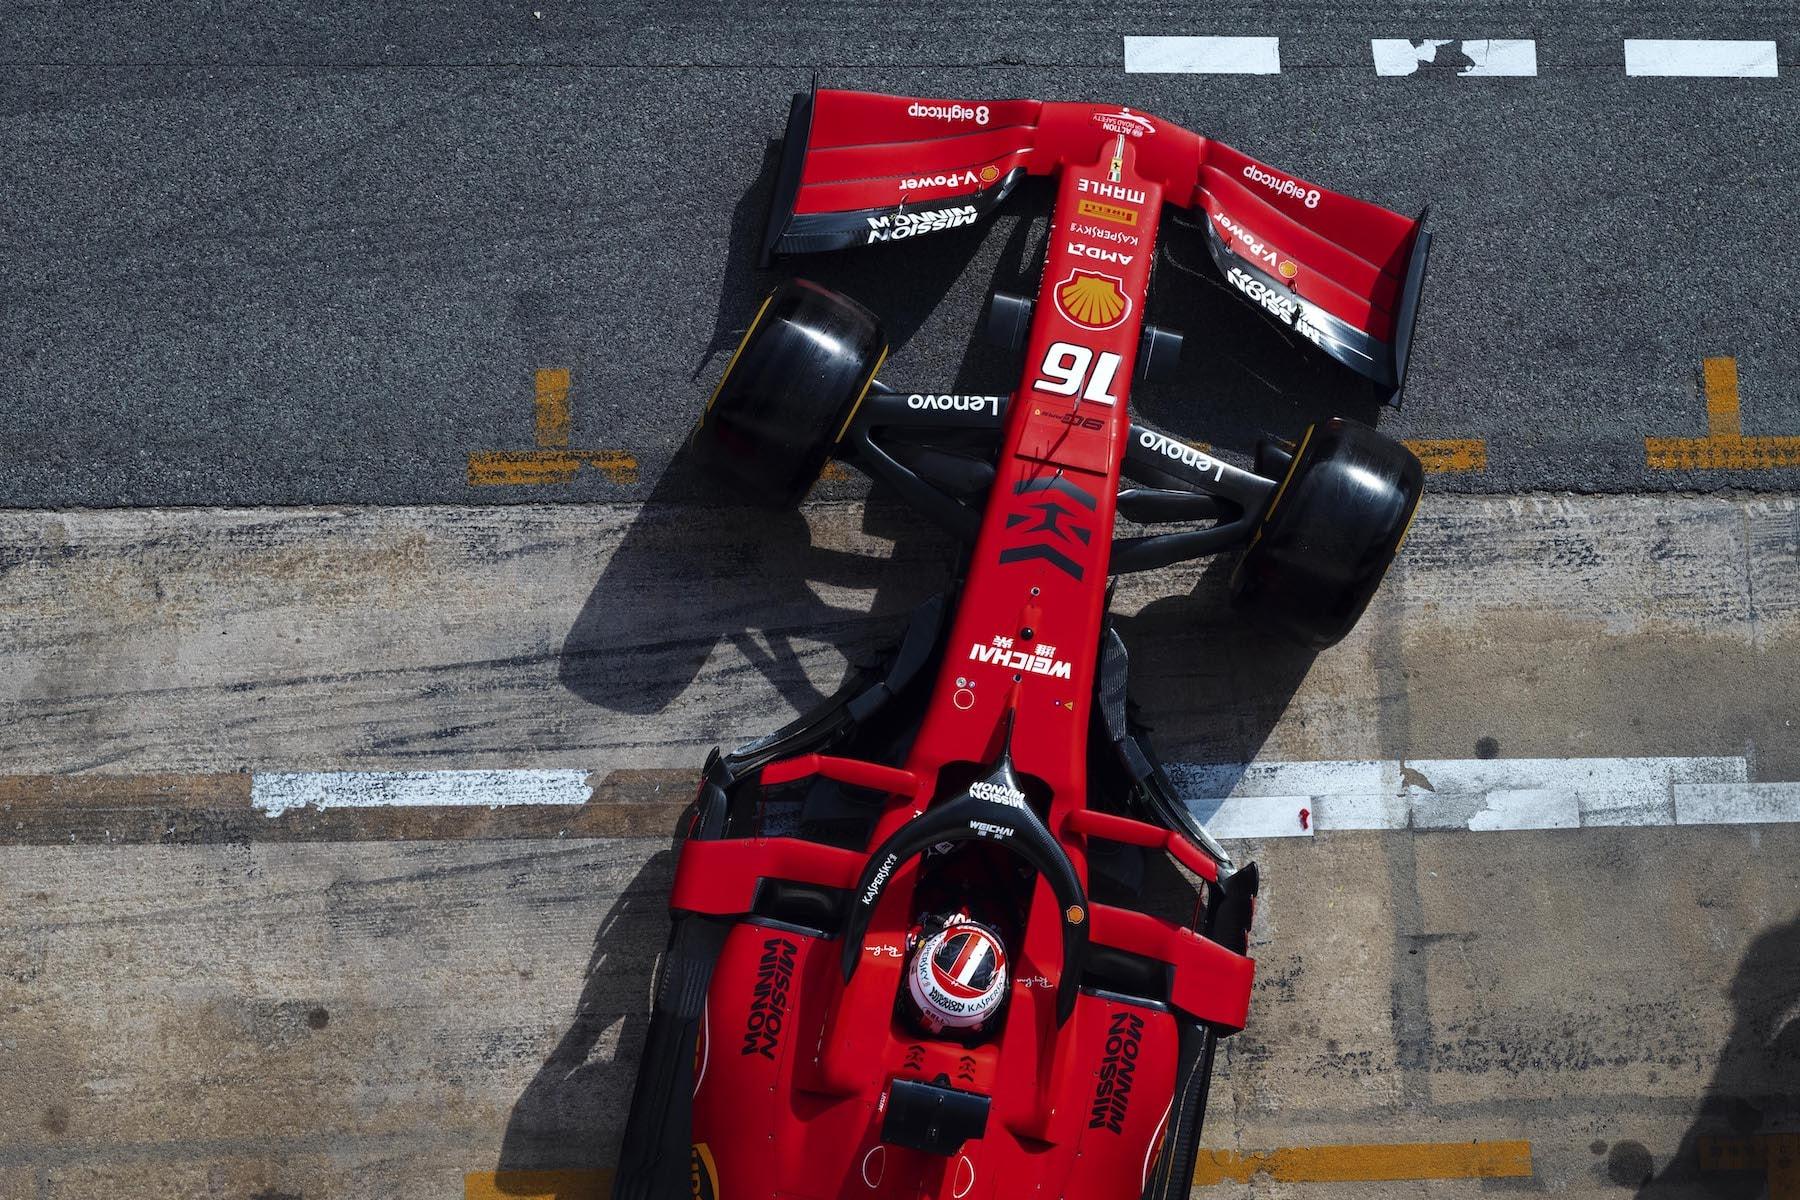 2019 Charles Leclerc   Ferrari SF90   2019 Barcelona T1 D2 6 copy.jpg